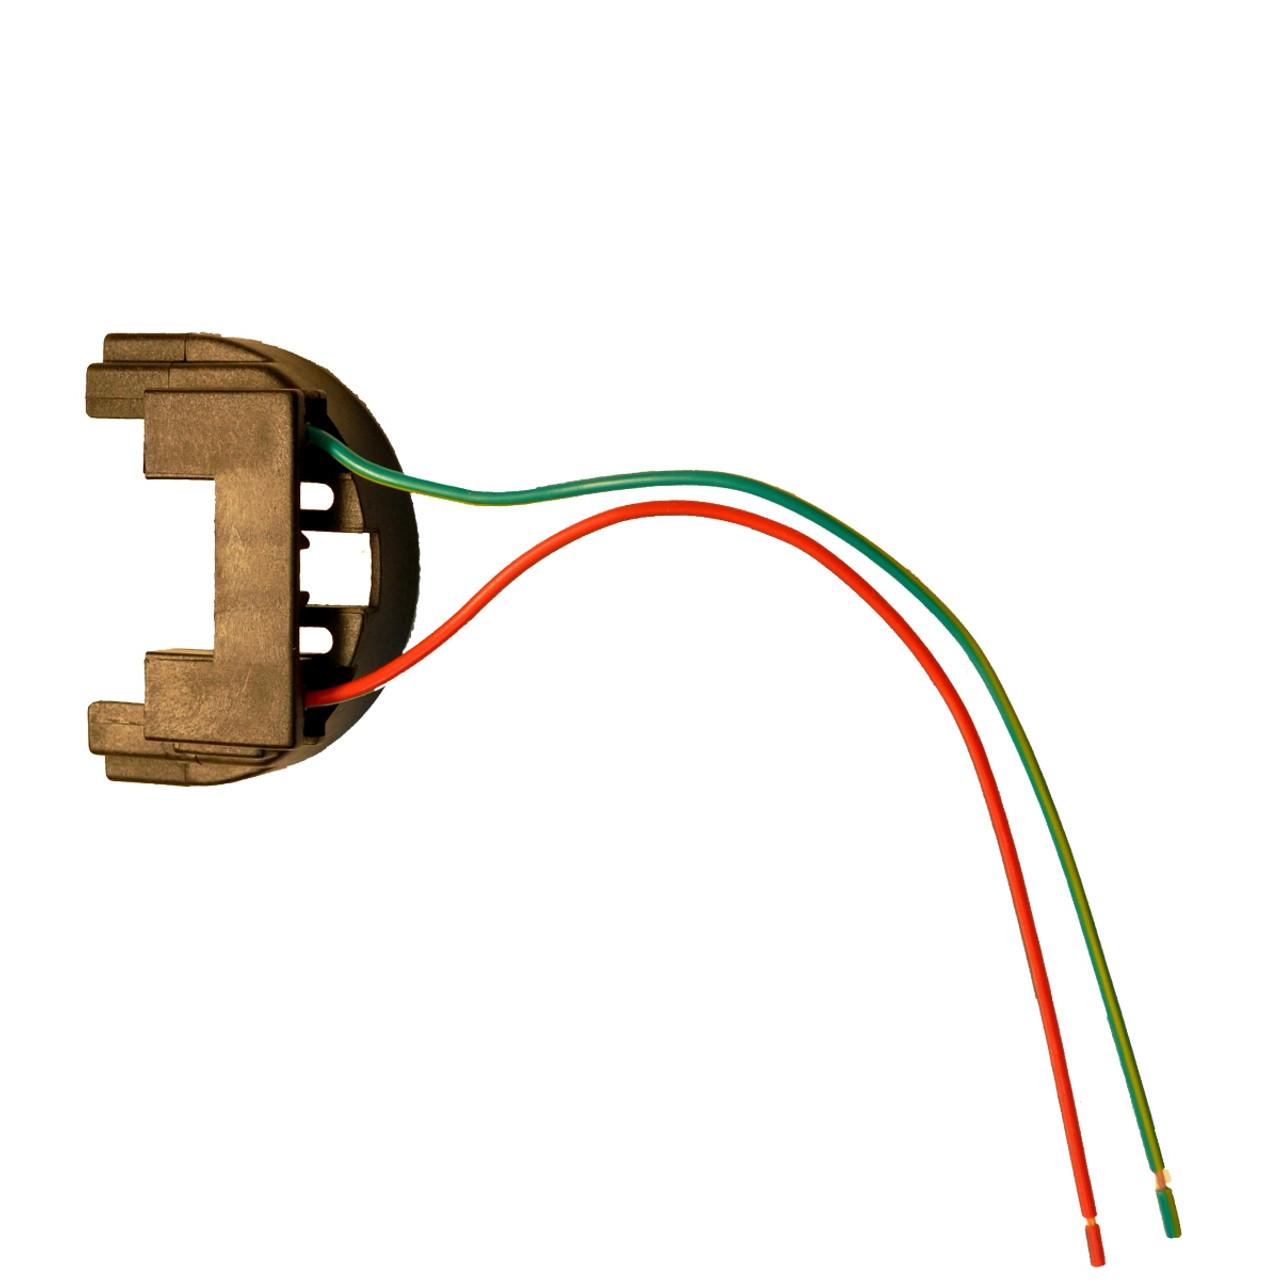 Coil Bracket Wire Connector Gw 1978 1989 Team Grand Wagoneer